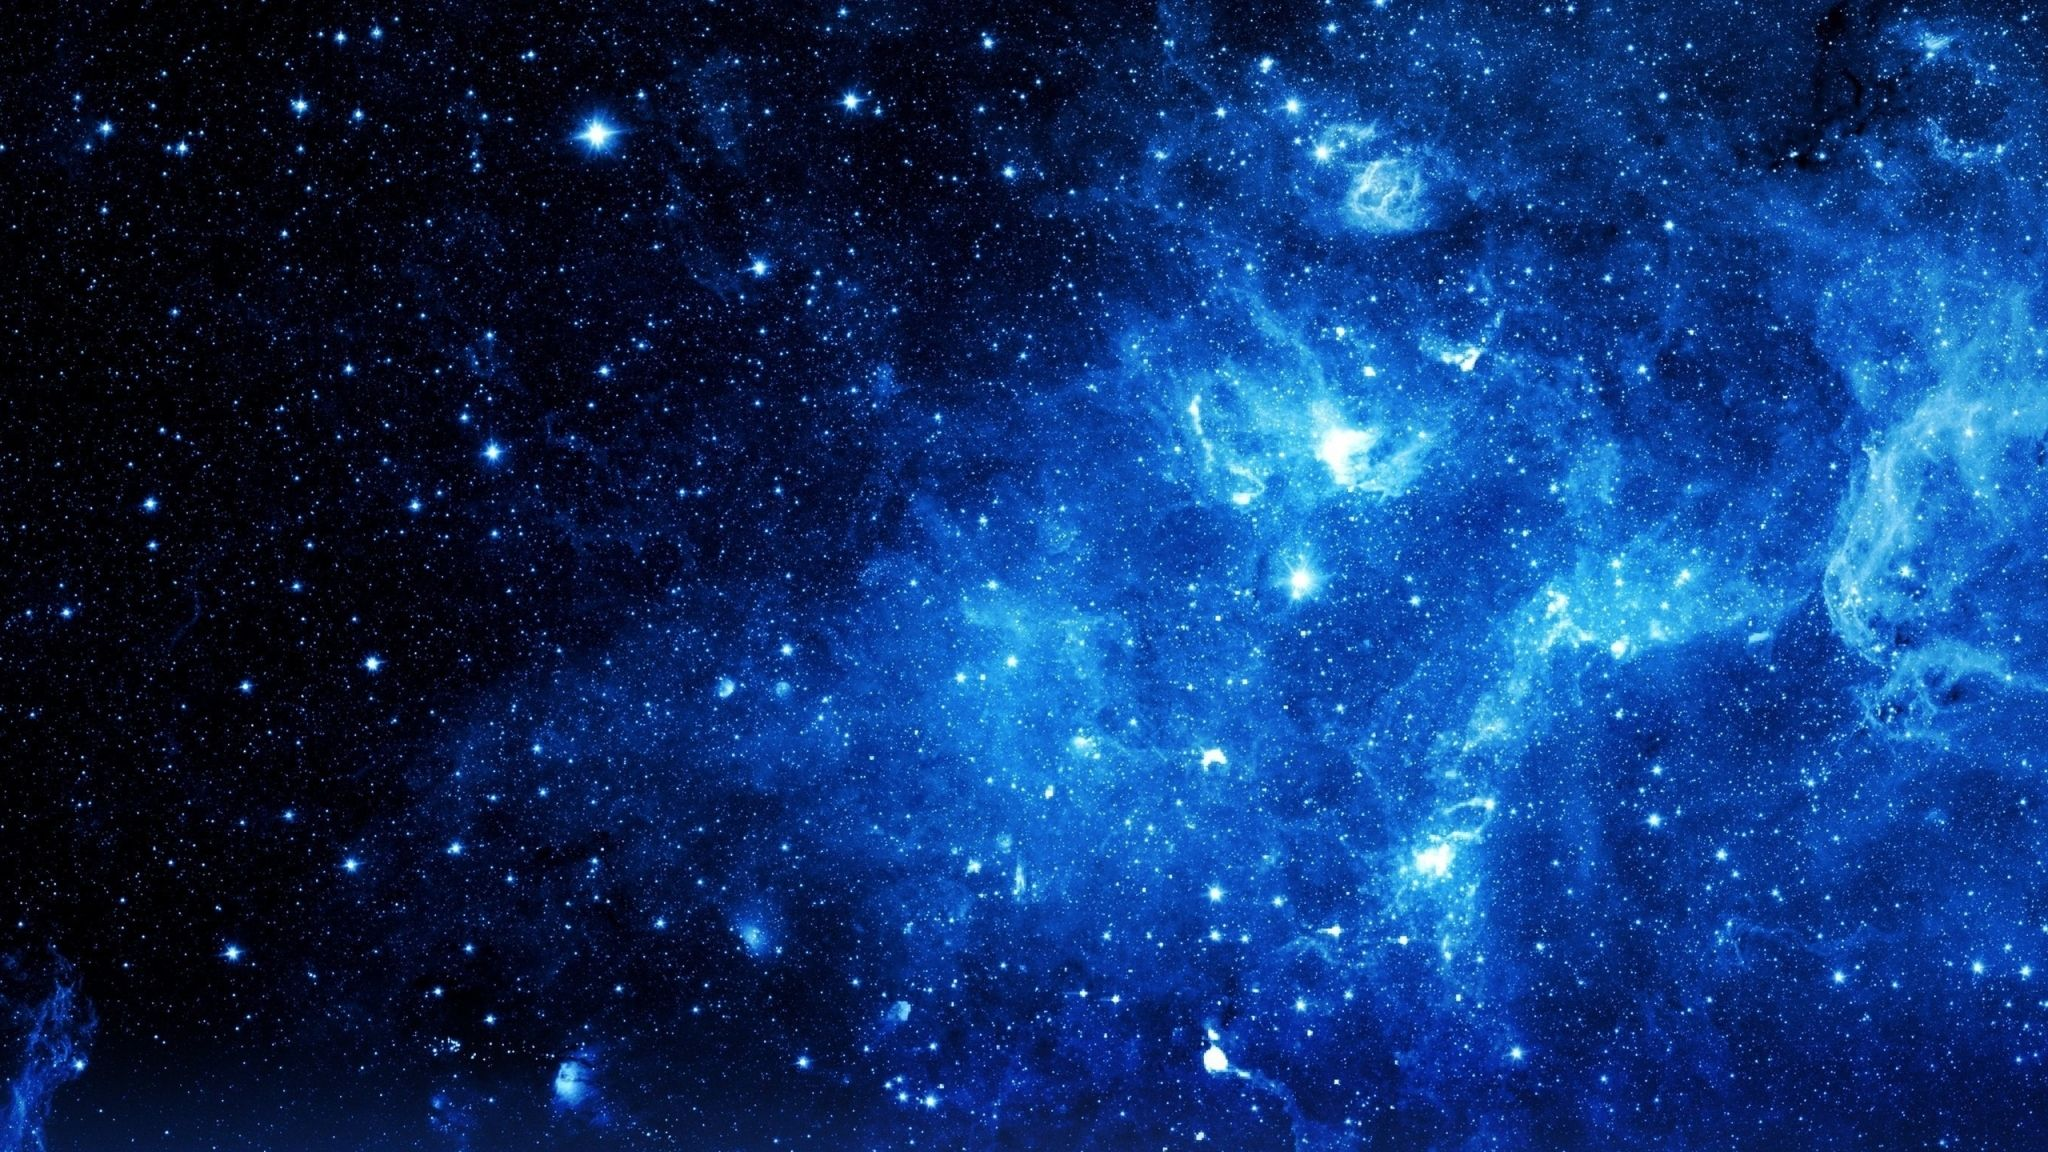 Papel De Parede Galaxia Azul - Pesquisa Google